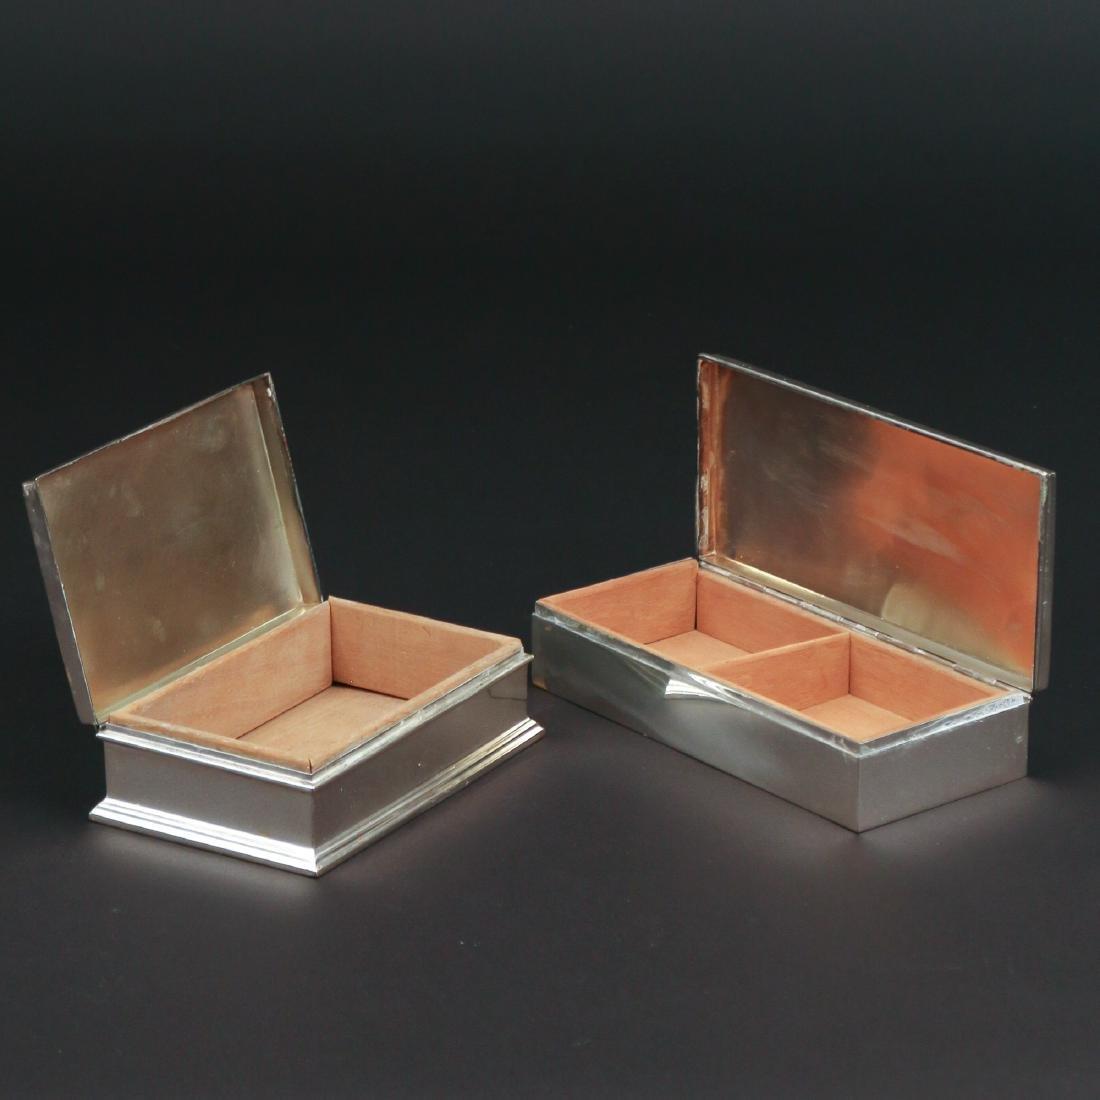 (2pc) STERLING SILVER CIGARETTE BOXES - 3